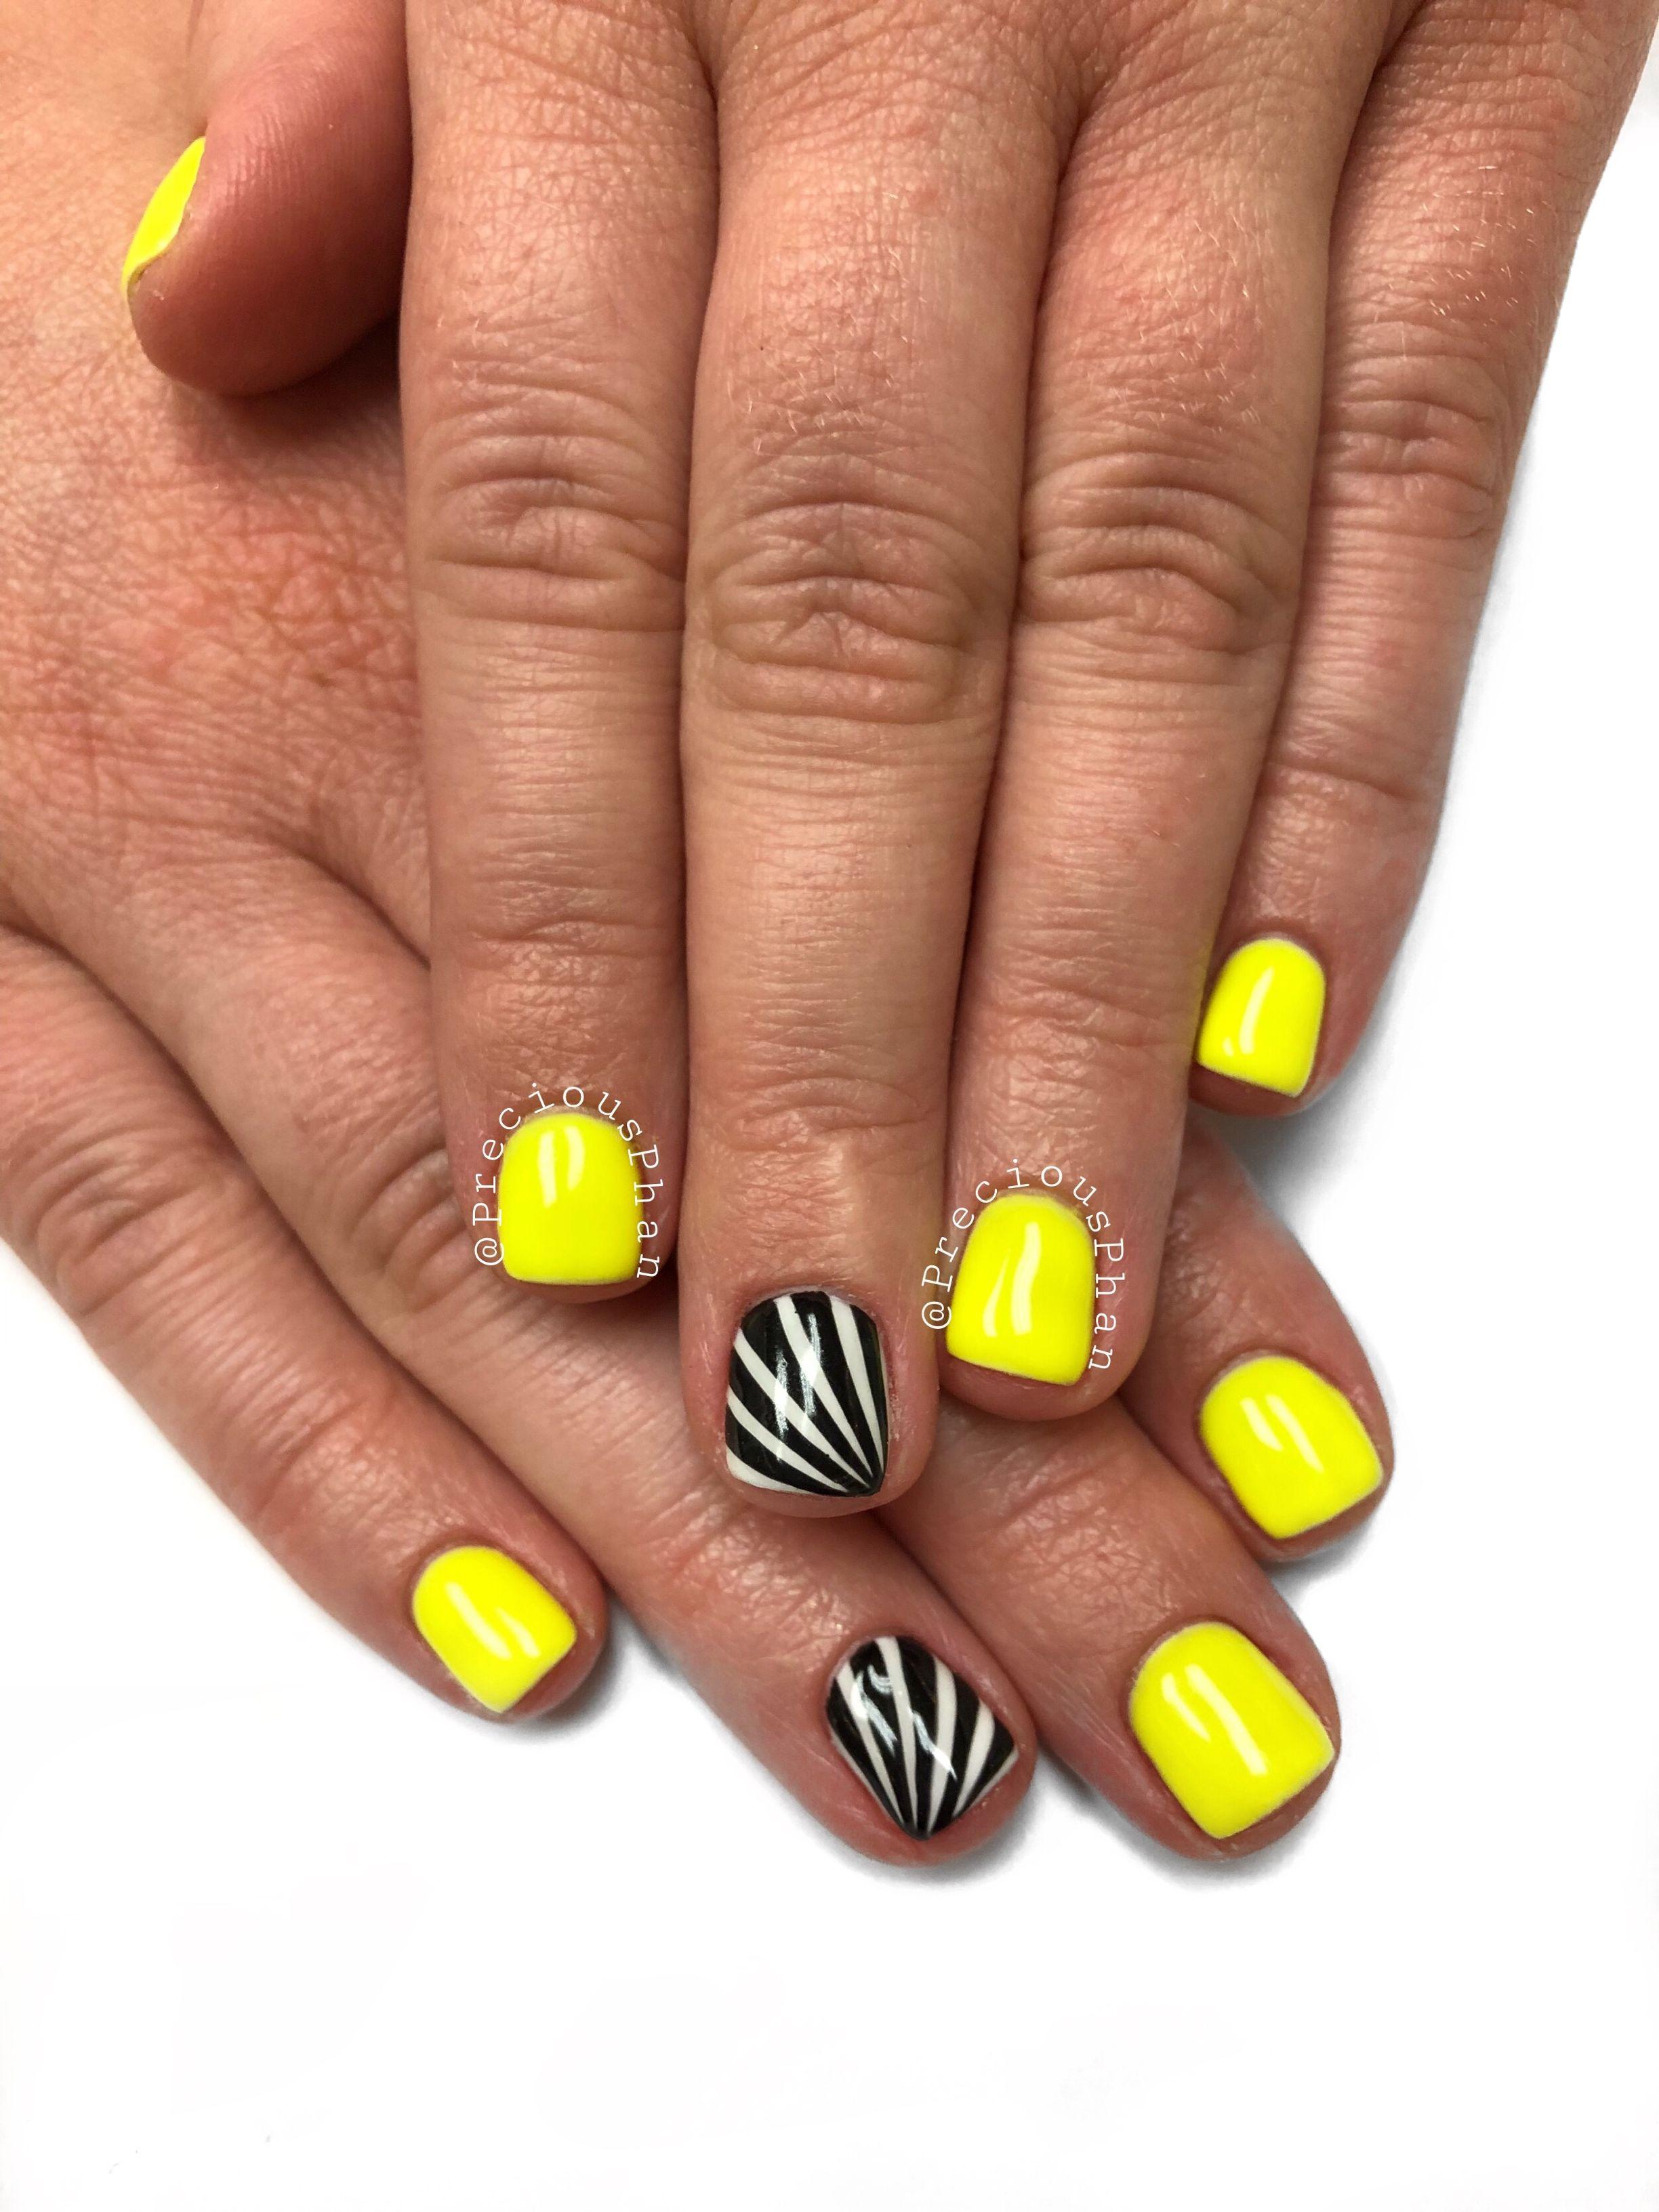 Neon Yellow Nails Black And White Dizzy Nails Preciousphan